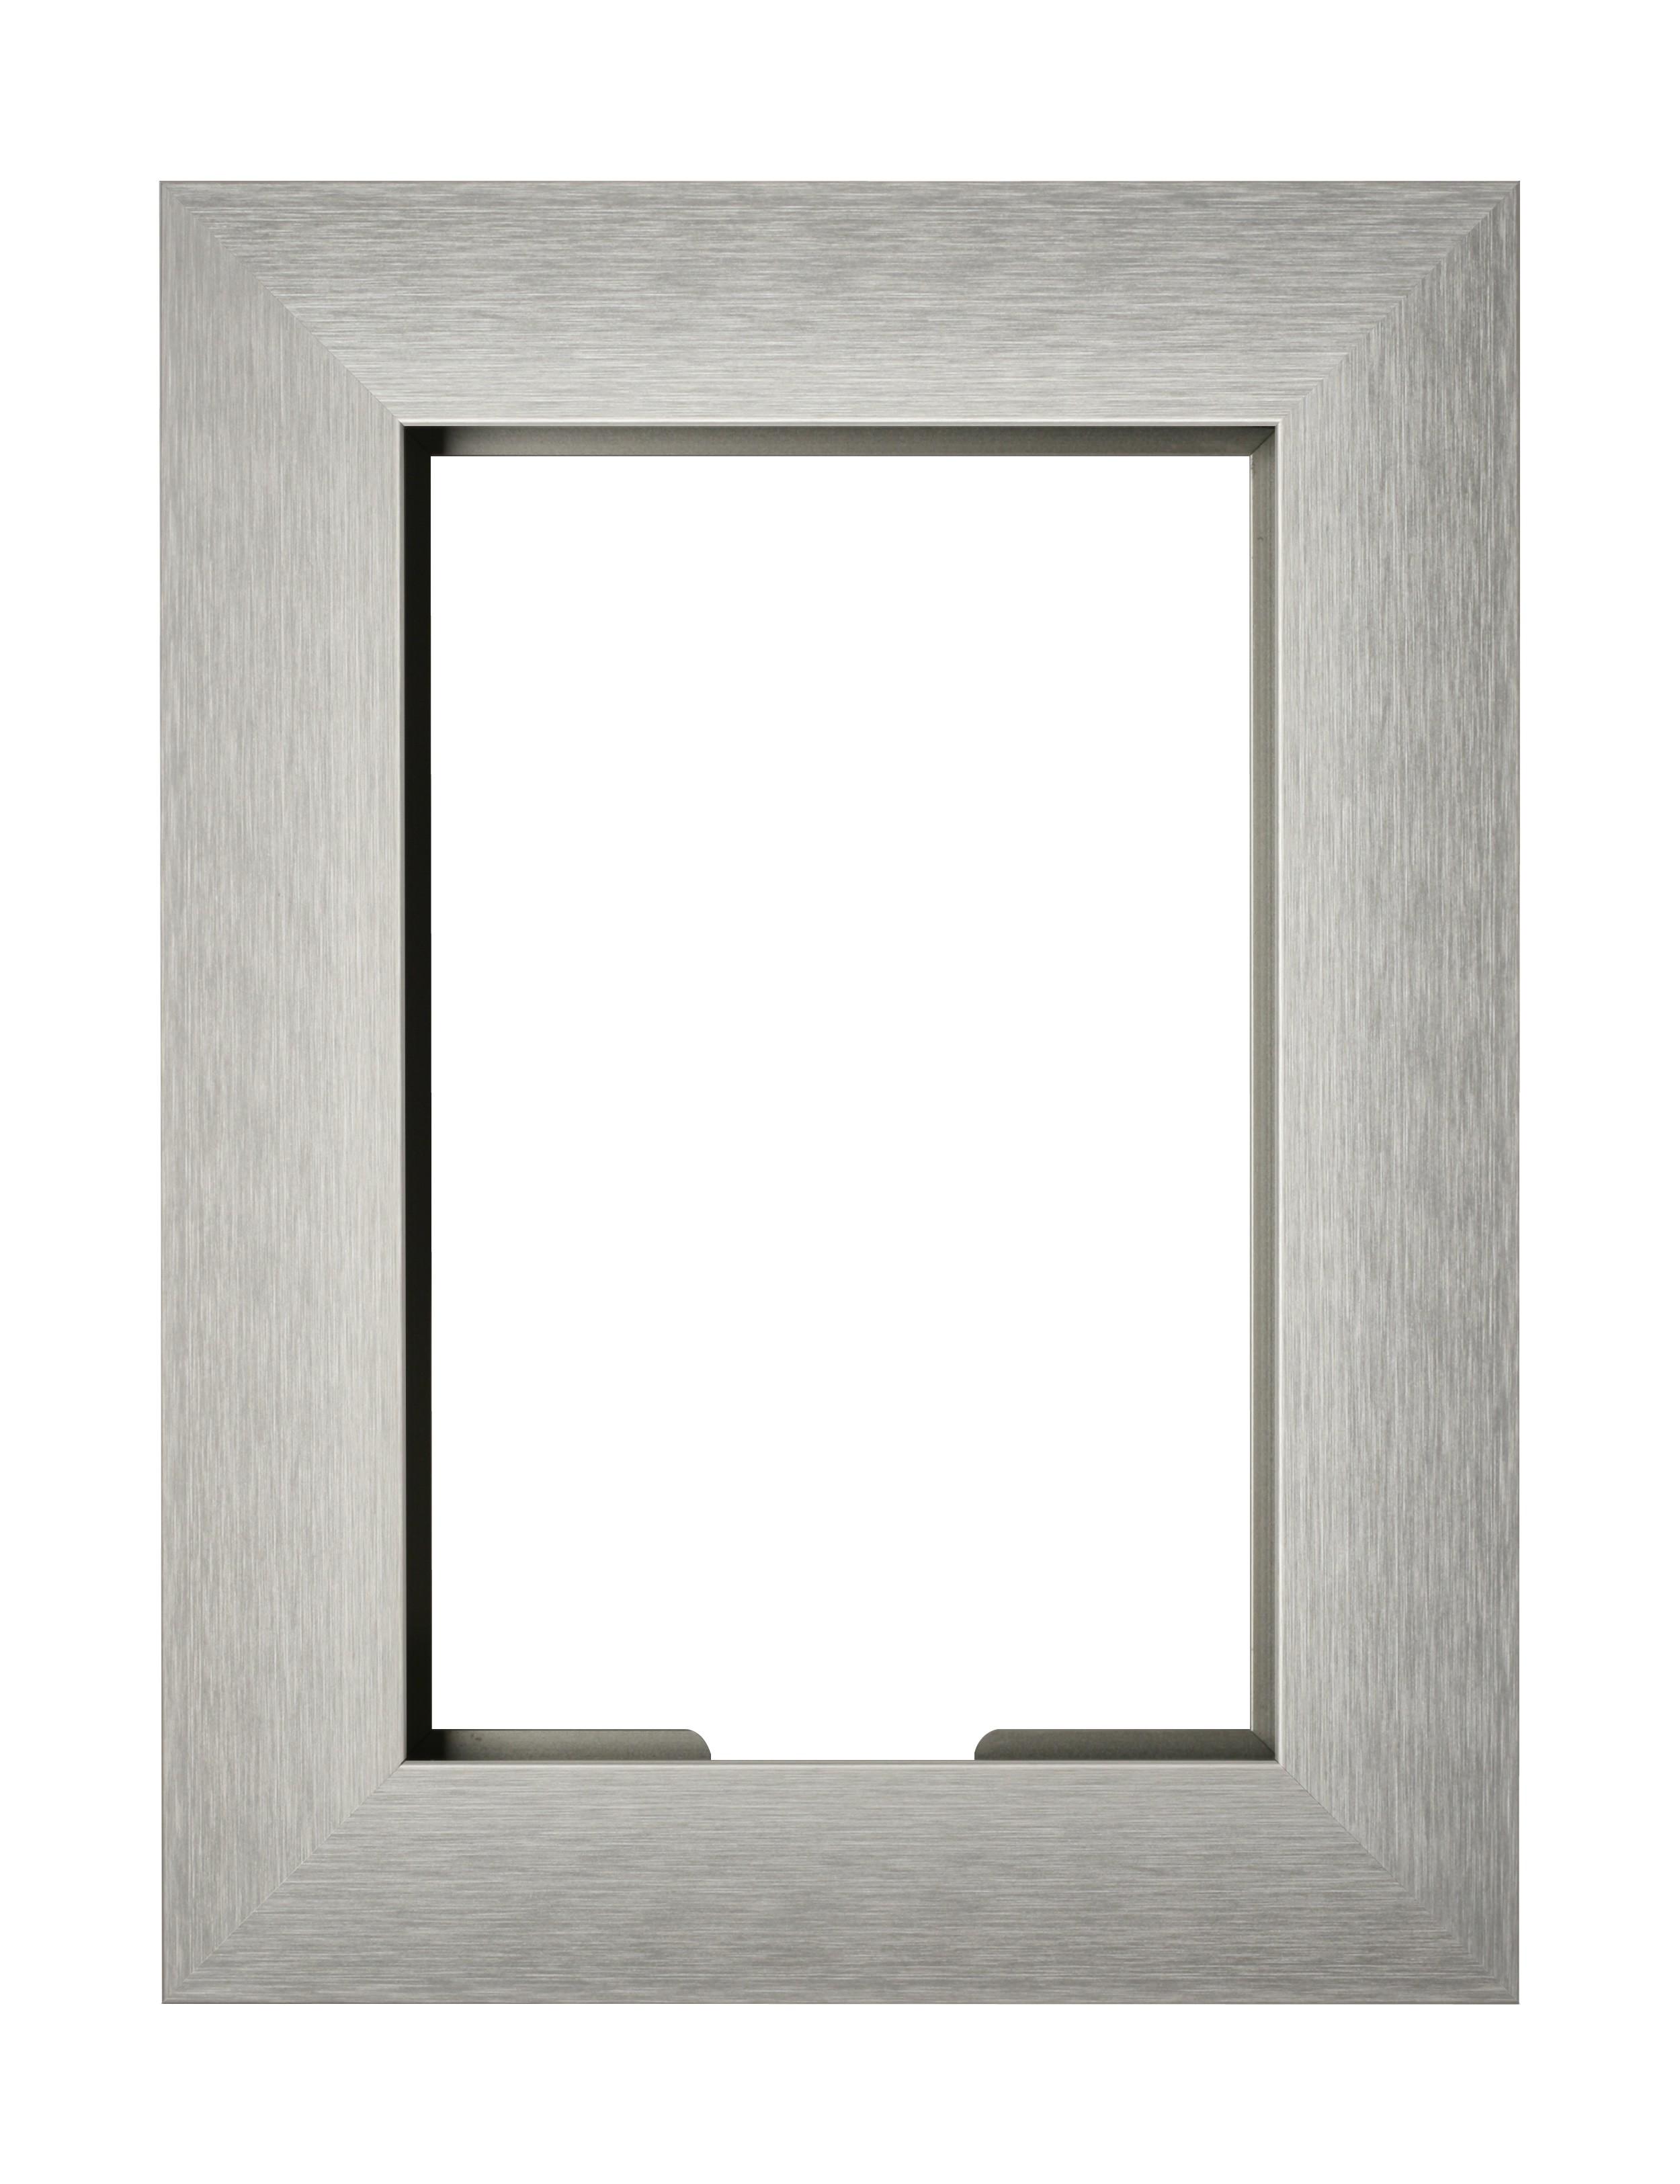 VidaMount Wall Frame - iPad Mini 1/2/3 - Brushed German Silver